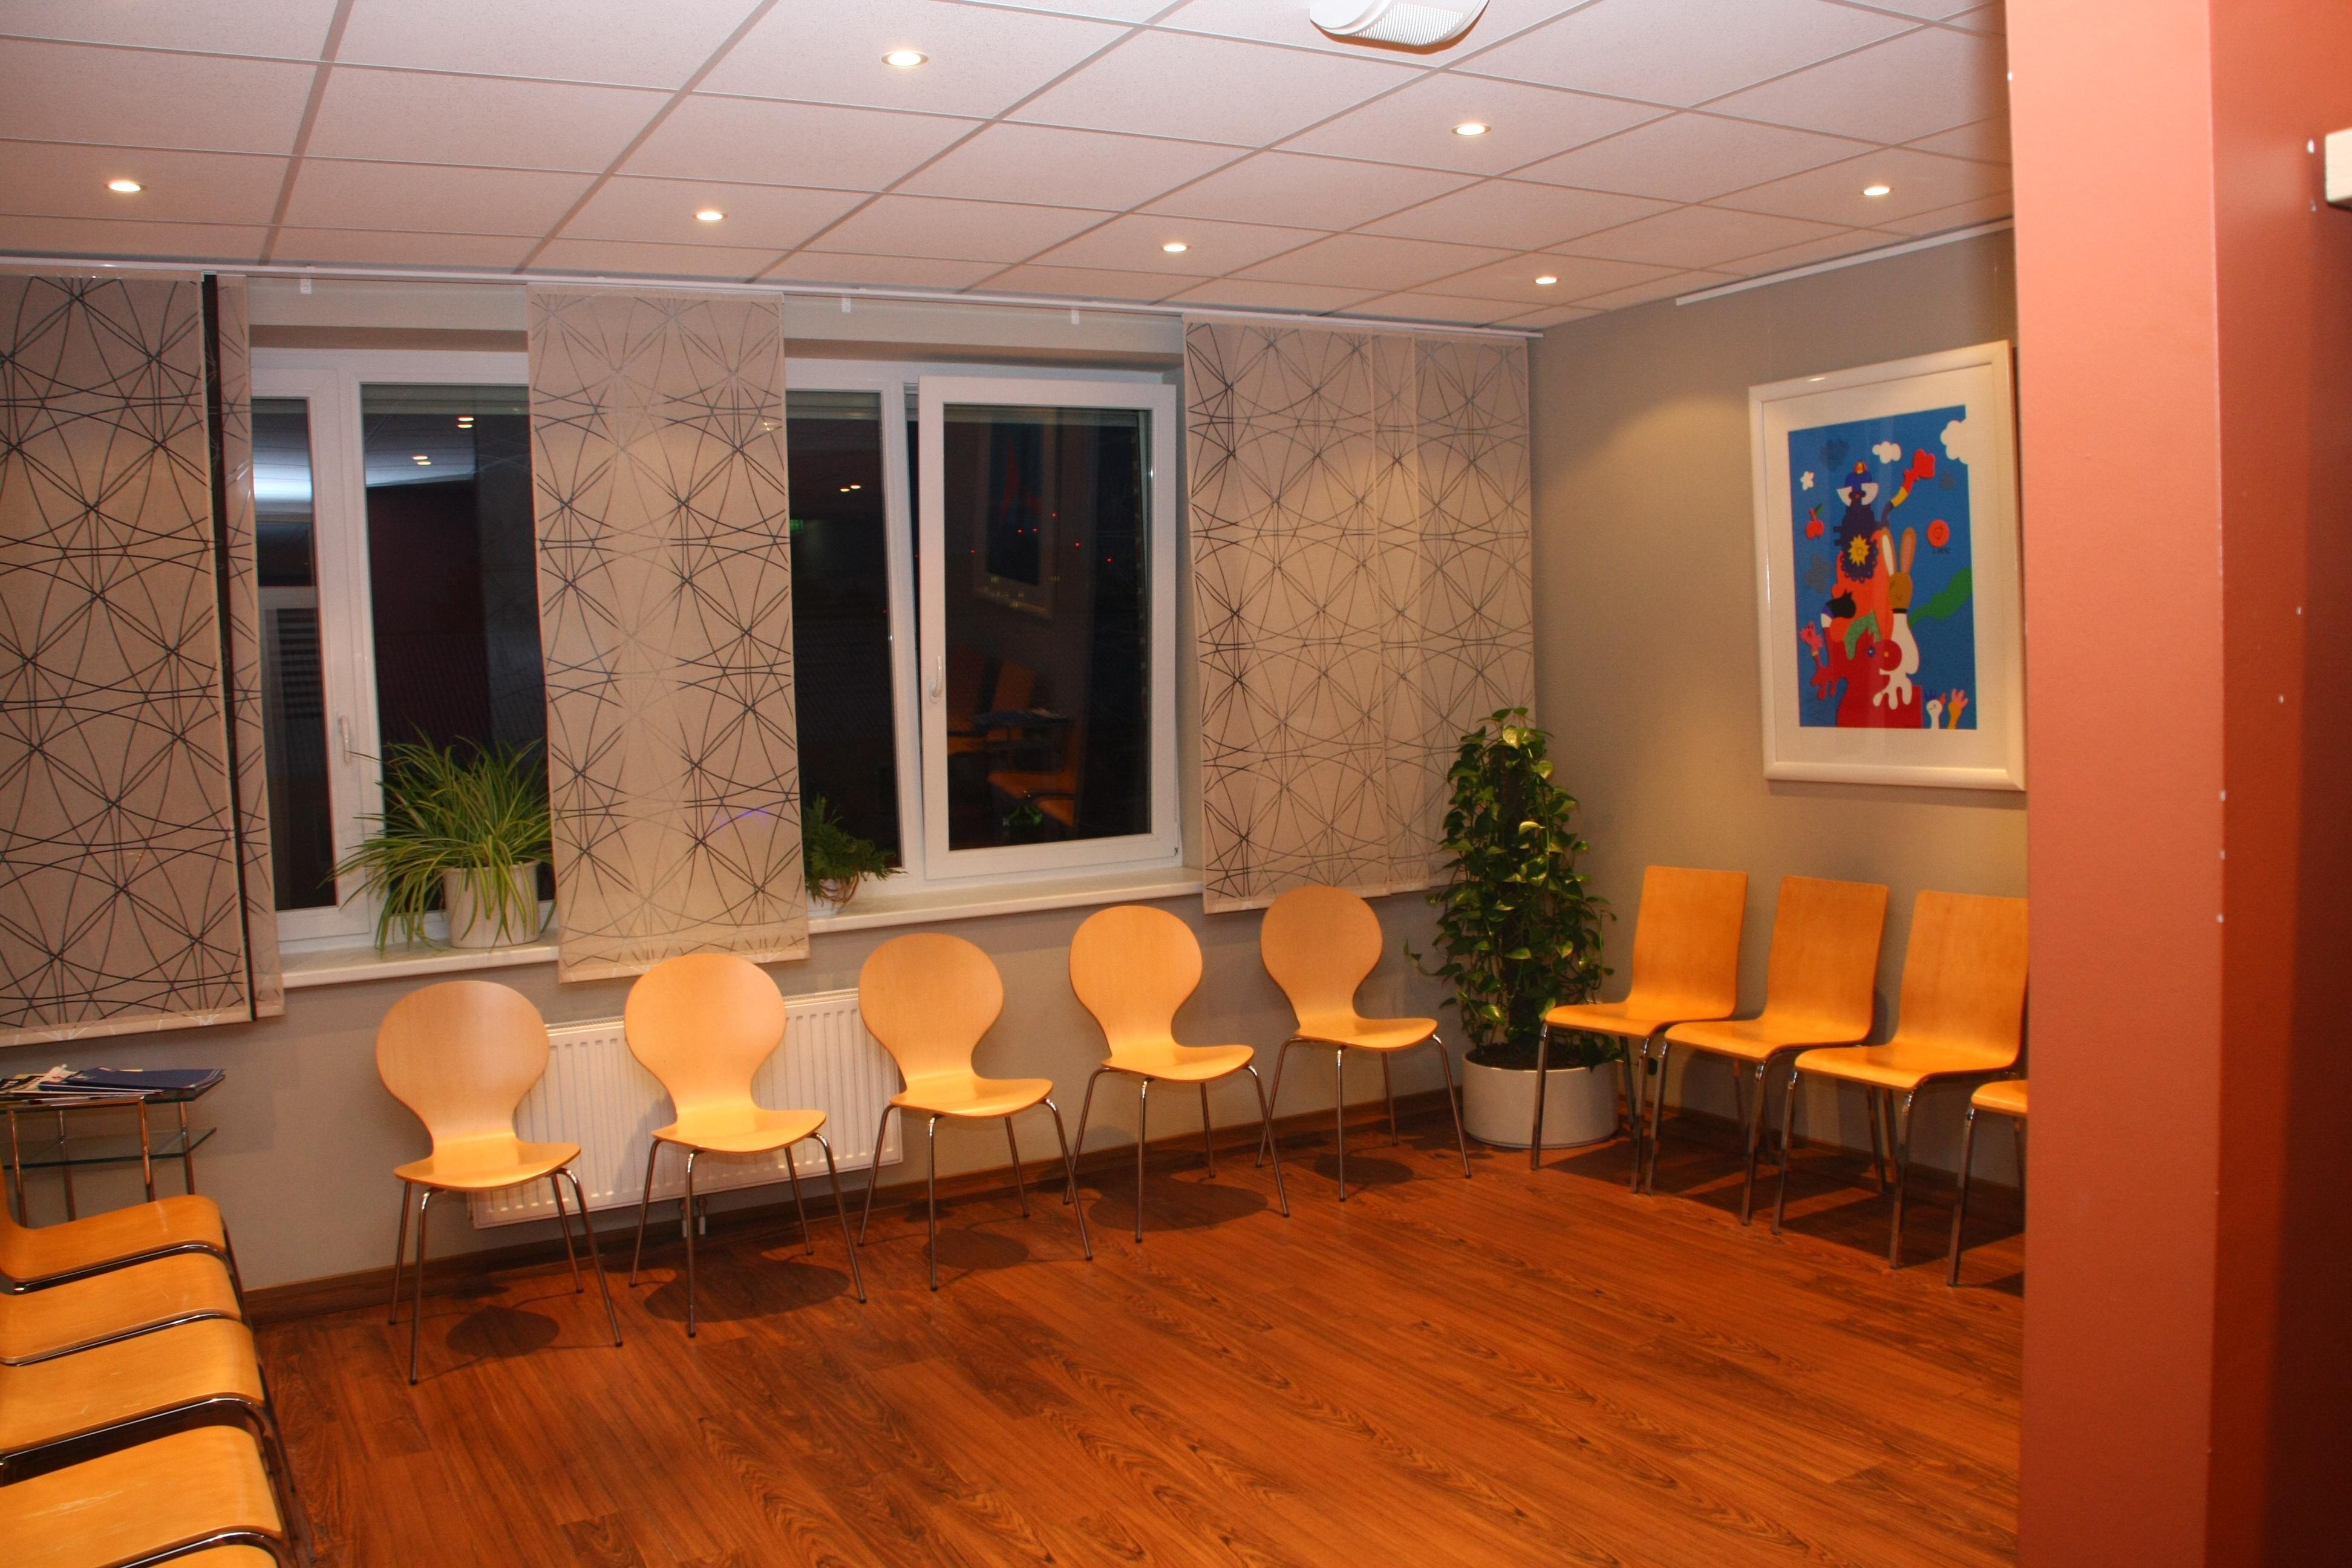 neurologie und psychiatrie facharztzentrum faz s d in l beck. Black Bedroom Furniture Sets. Home Design Ideas